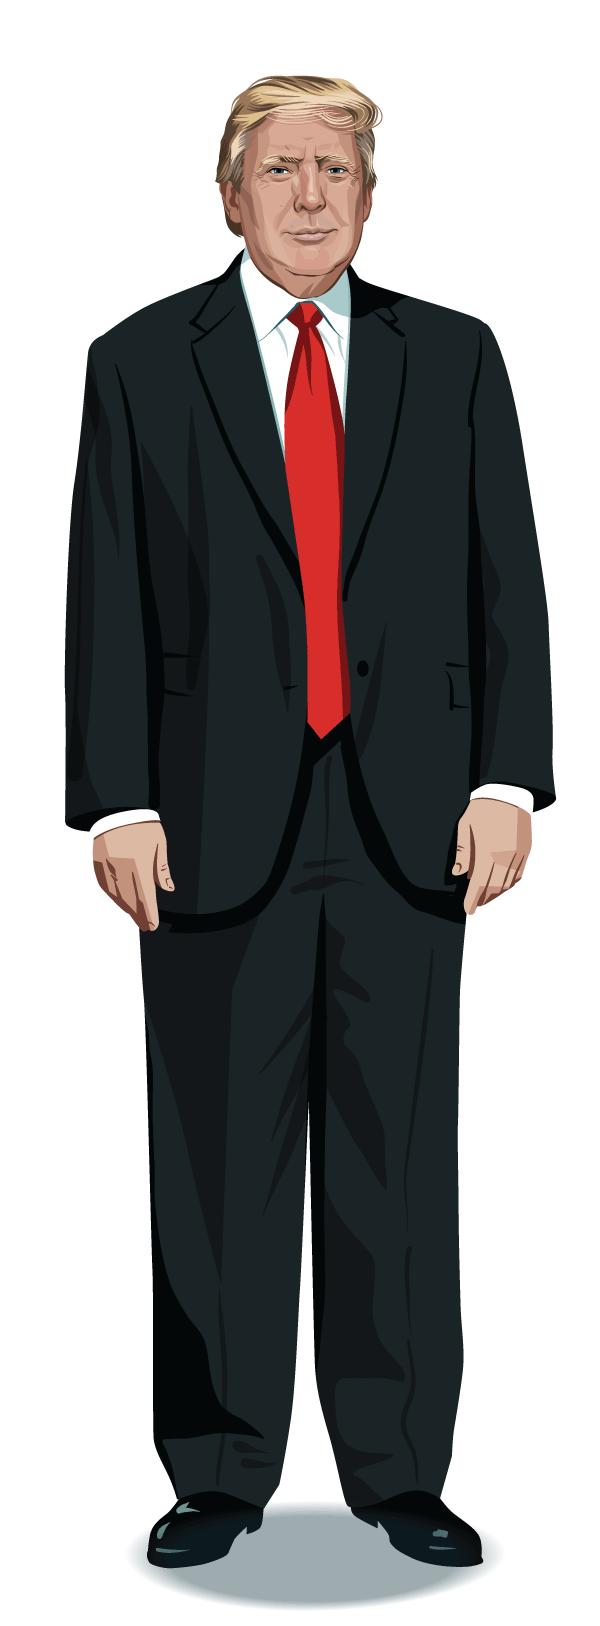 DonaldTrump_New